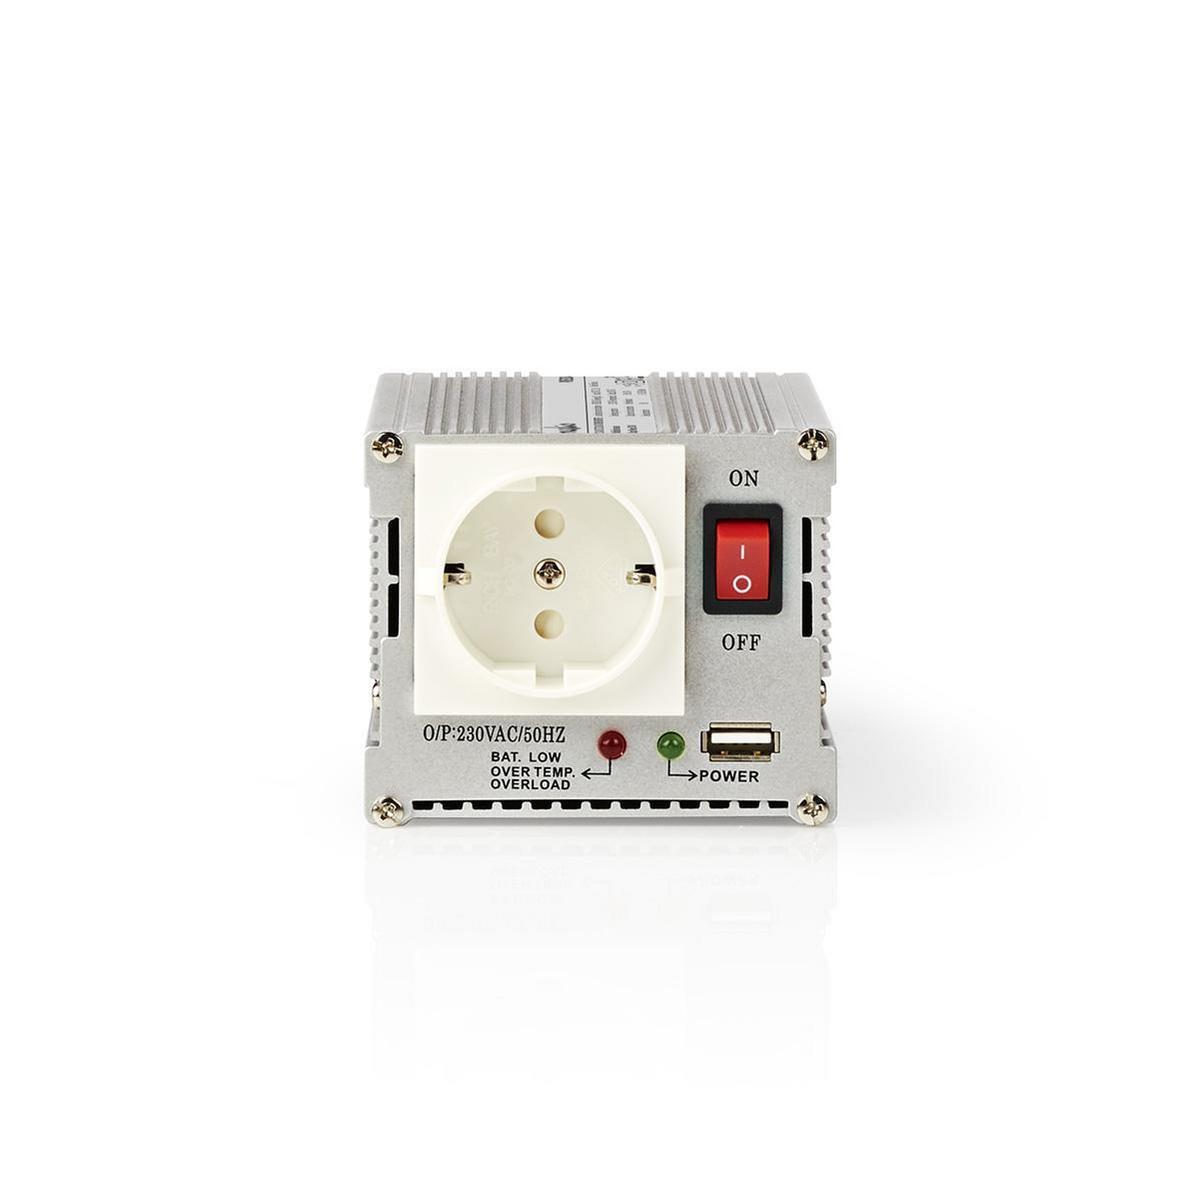 Stroomomvormer Gemodificeerde Sinusgolf | 24 V DC 230 V AC | 300 W | 1x Schuko-1x USB-Uitgang